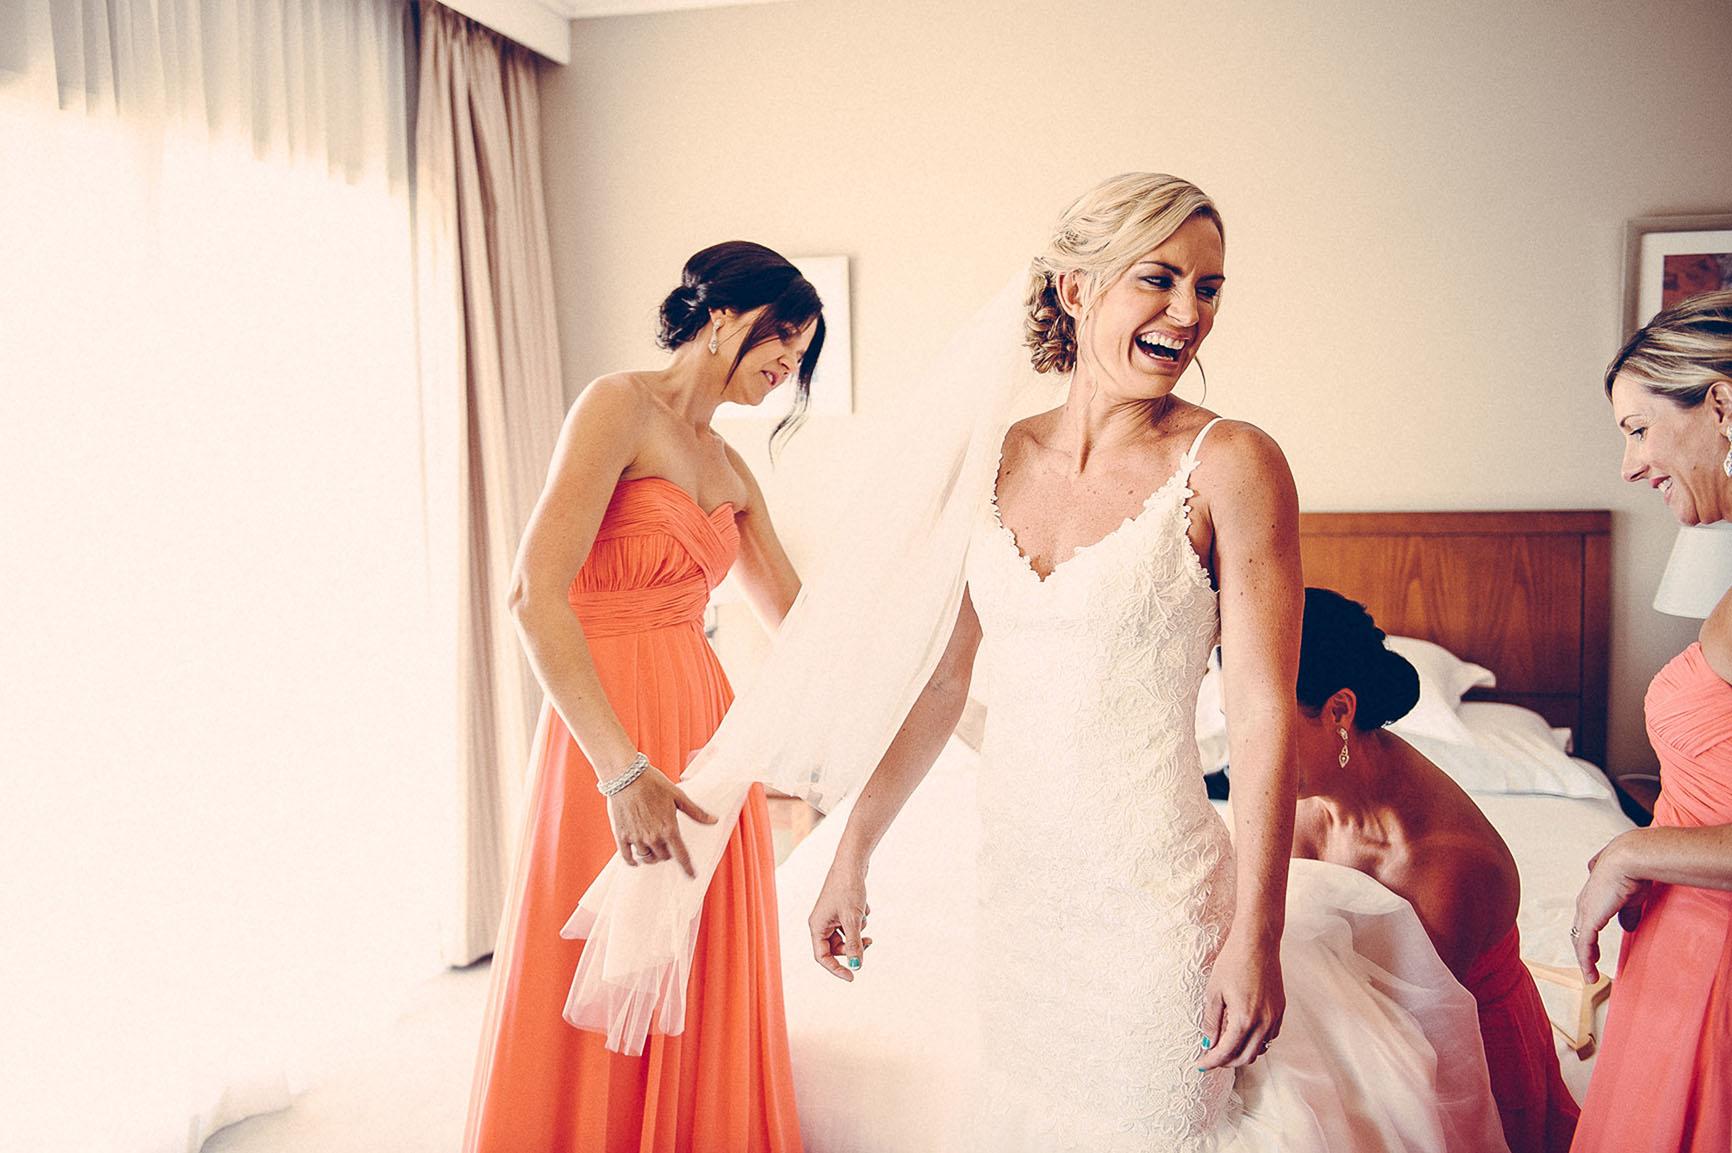 Marryme_wedding_photography_dorrigo_bellingen_photographer_40.jpg